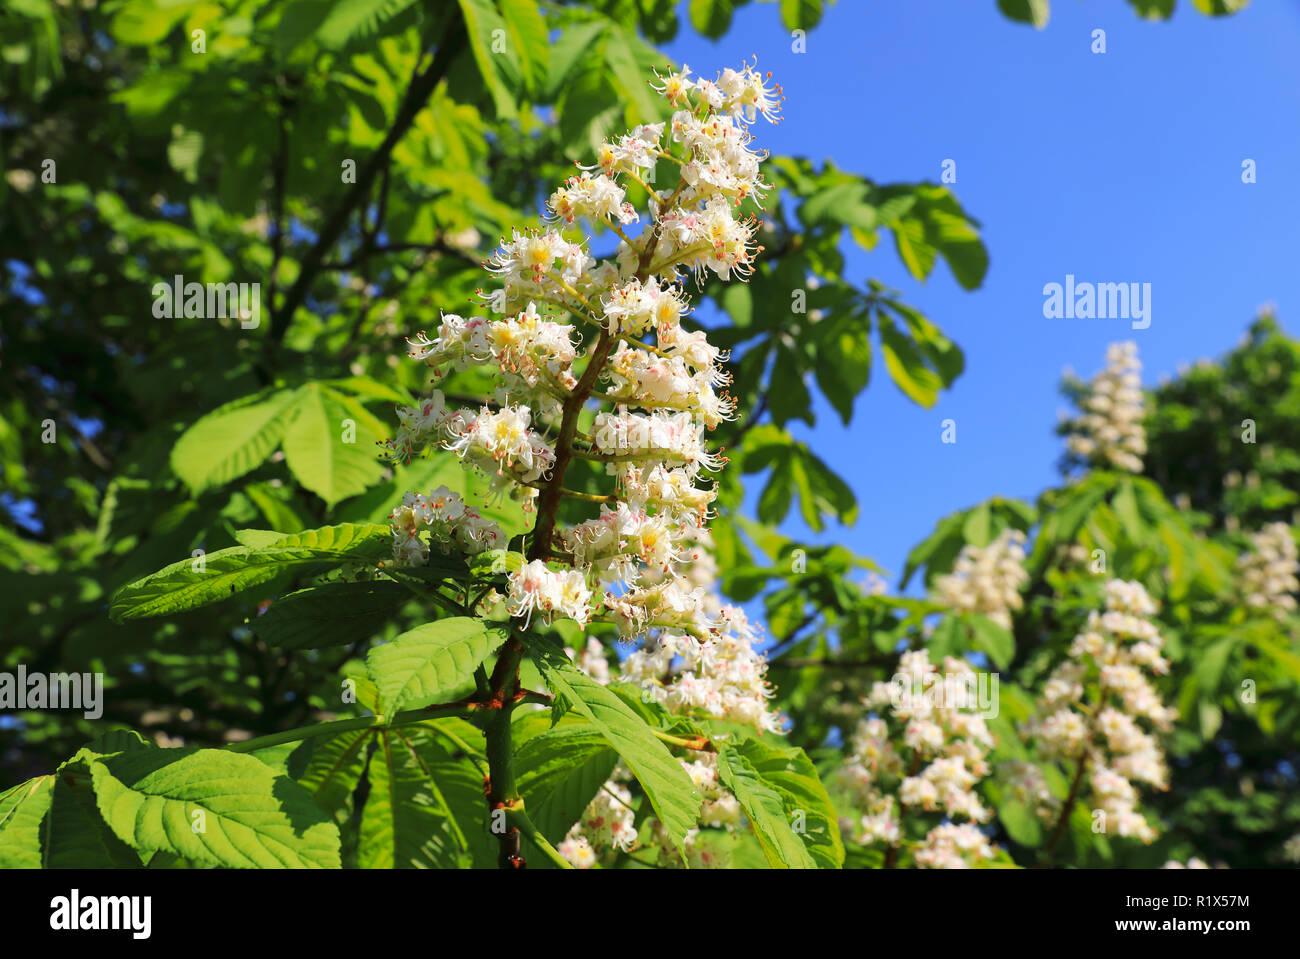 Horse chestnut flowers in Regents Park in springtime in London, UK - Stock Image